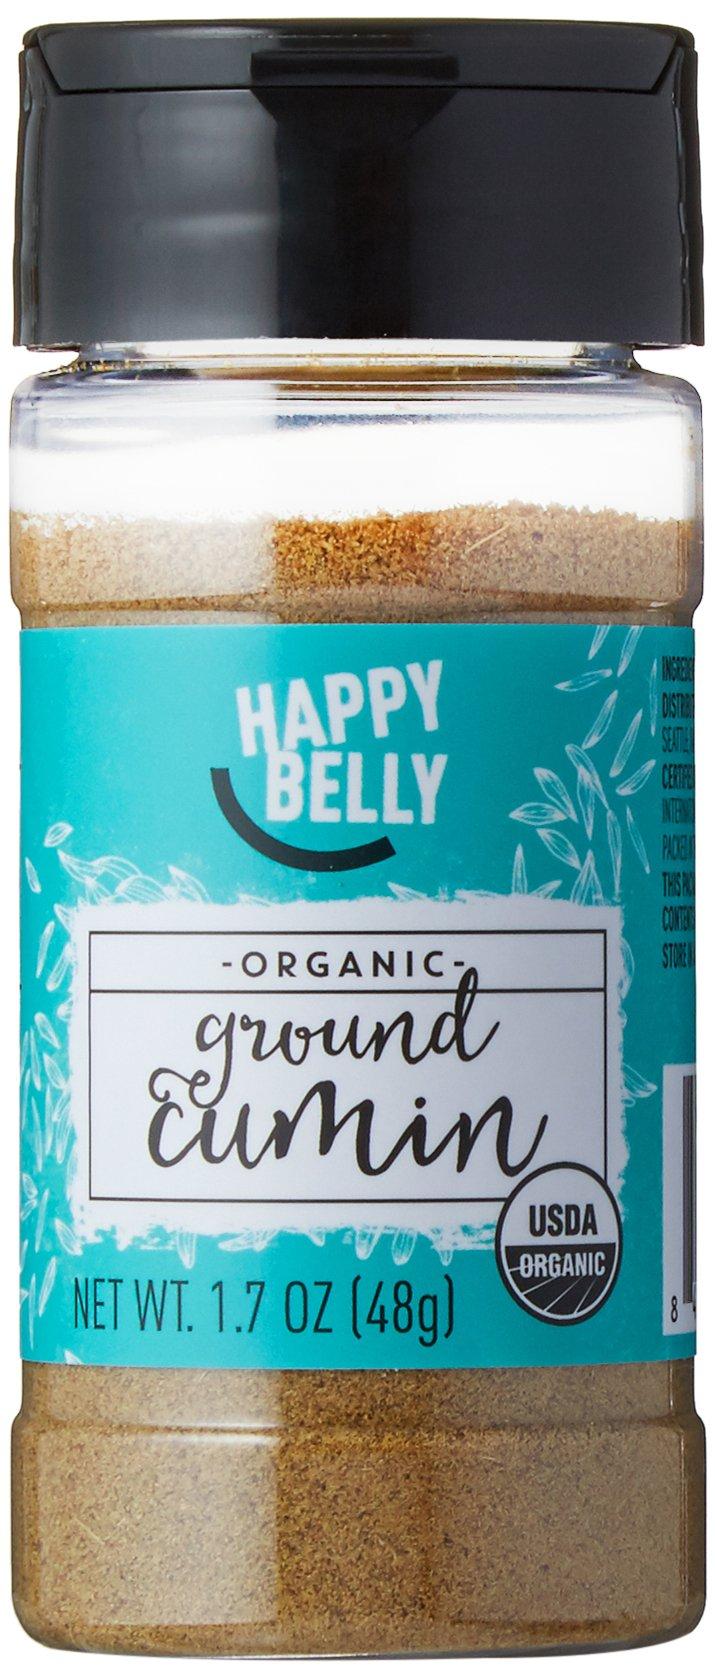 Amazon Brand - Happy Belly Organic Cumin, Ground, 1.7-Ounce